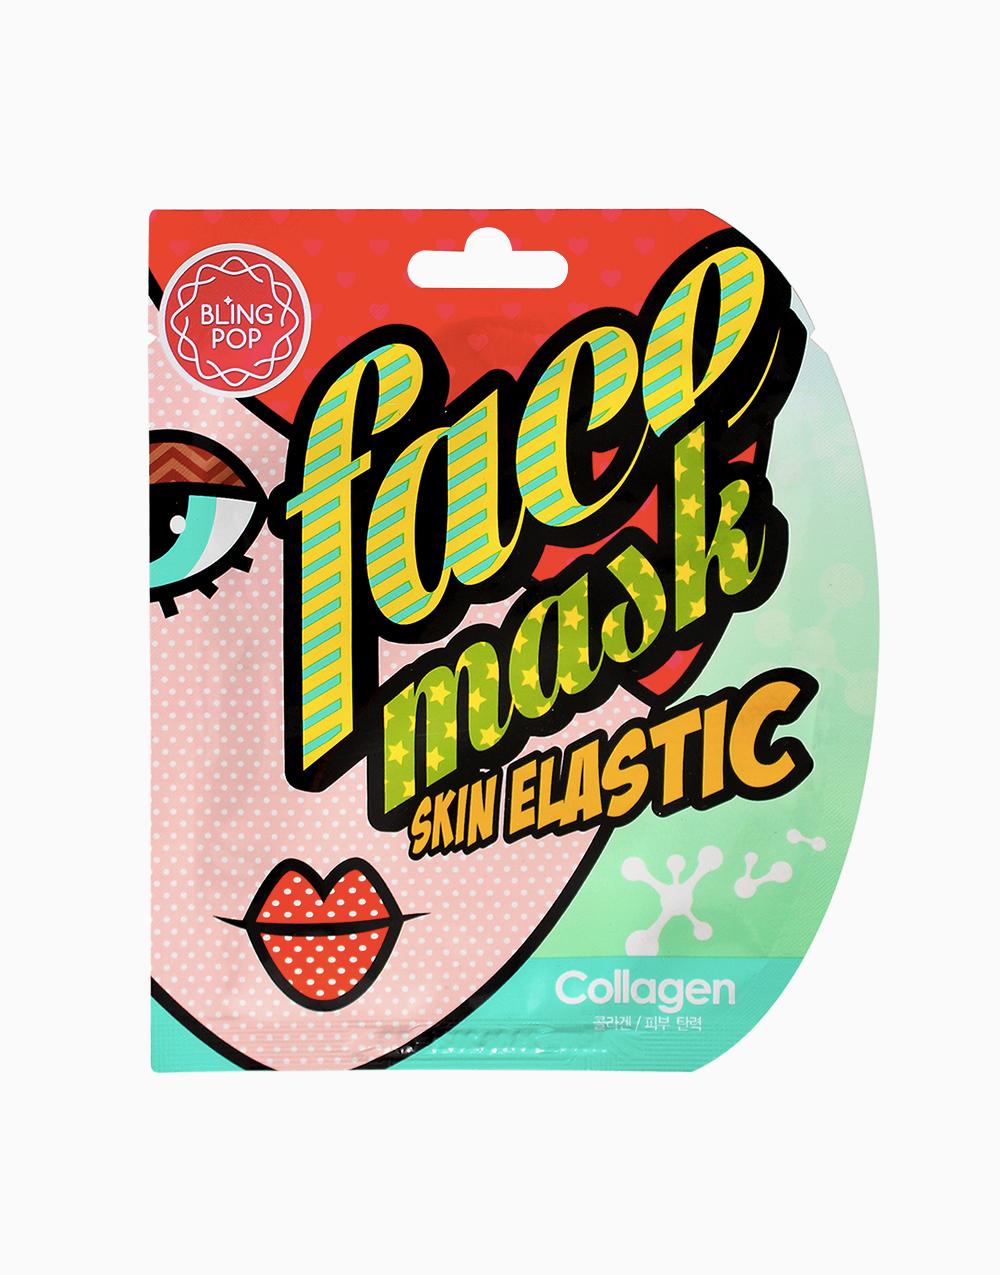 Collagen Skin Elastic Gel Face Mask by BlingPop